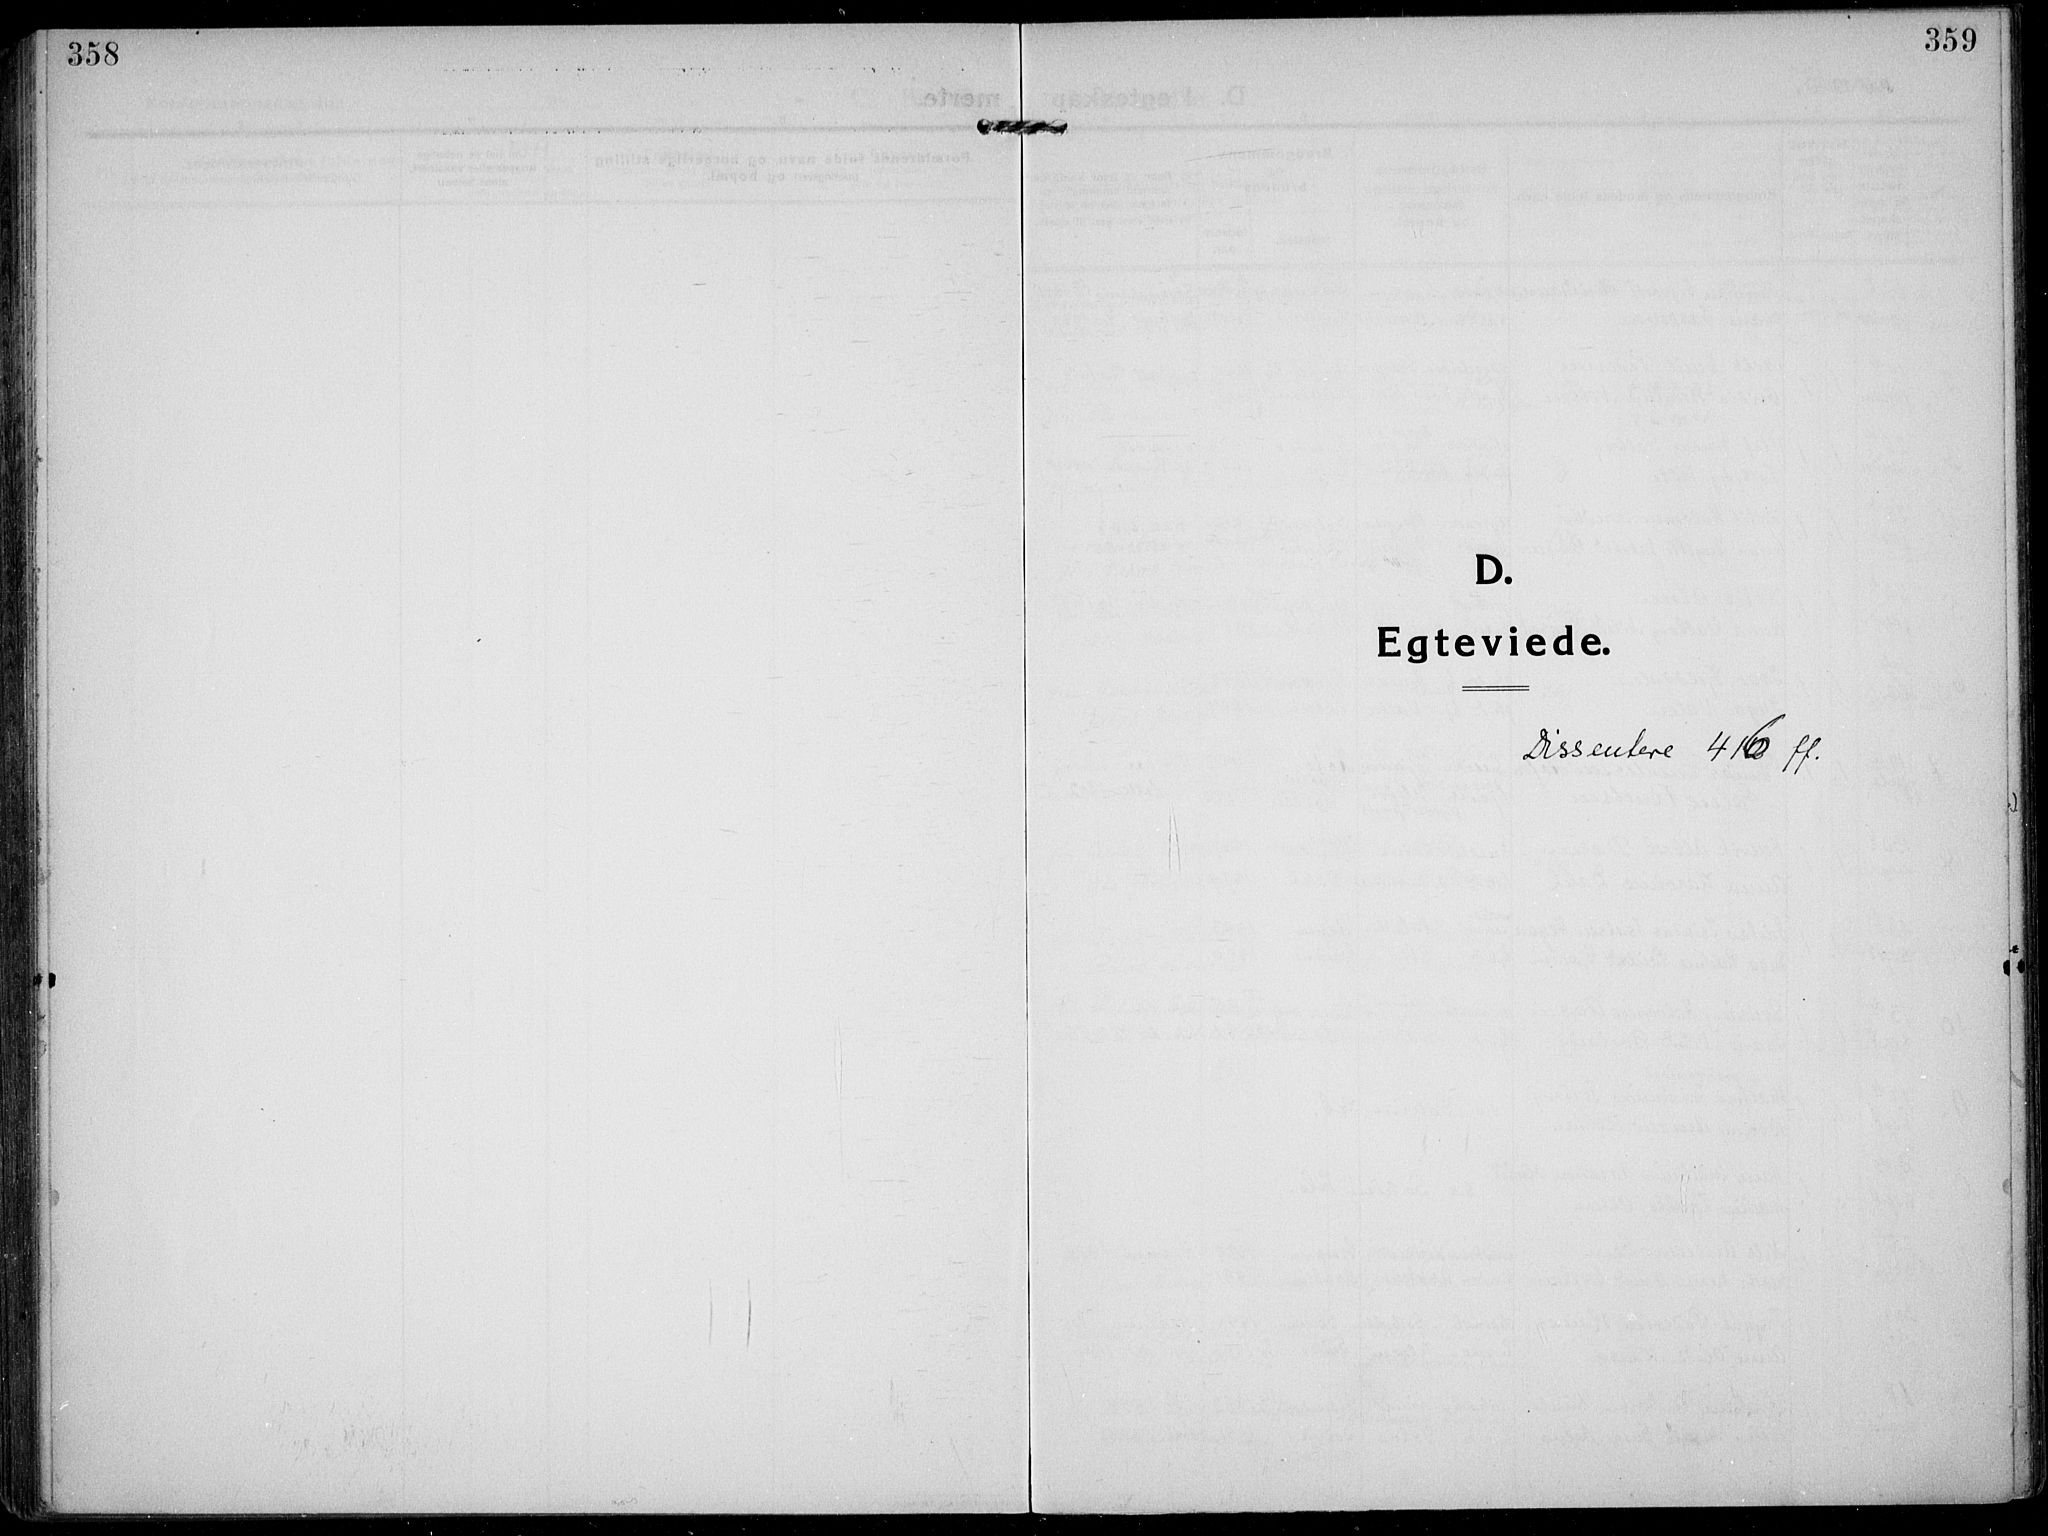 SAKO, Solum kirkebøker, F/Fb/L0004: Ministerialbok nr. II 4, 1913-1924, s. 358-359